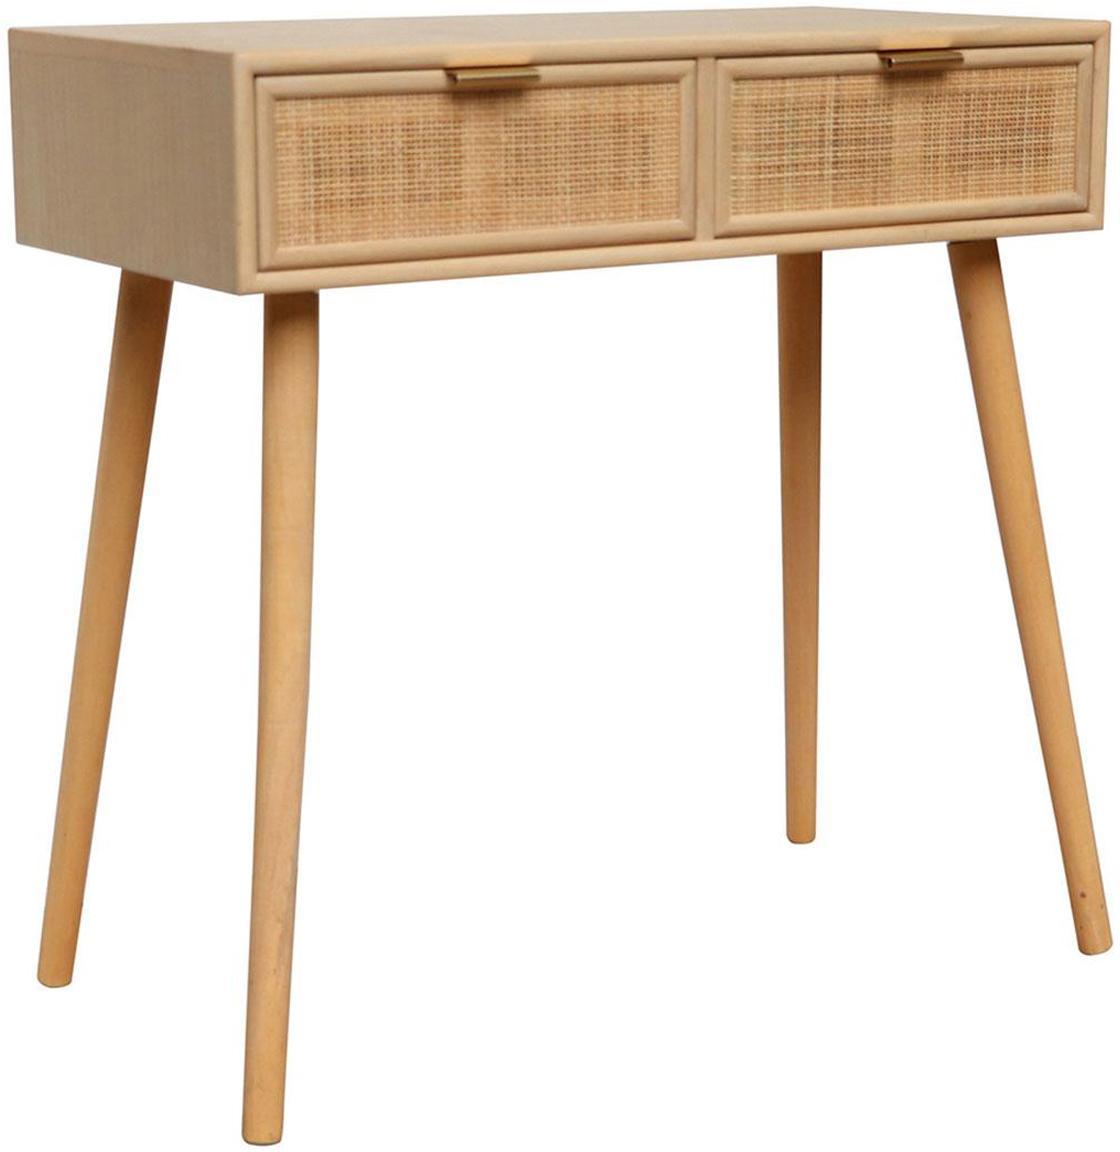 Escritorio Cayetana, Estructura: madera, Beige, An 80 x Al 79 cm